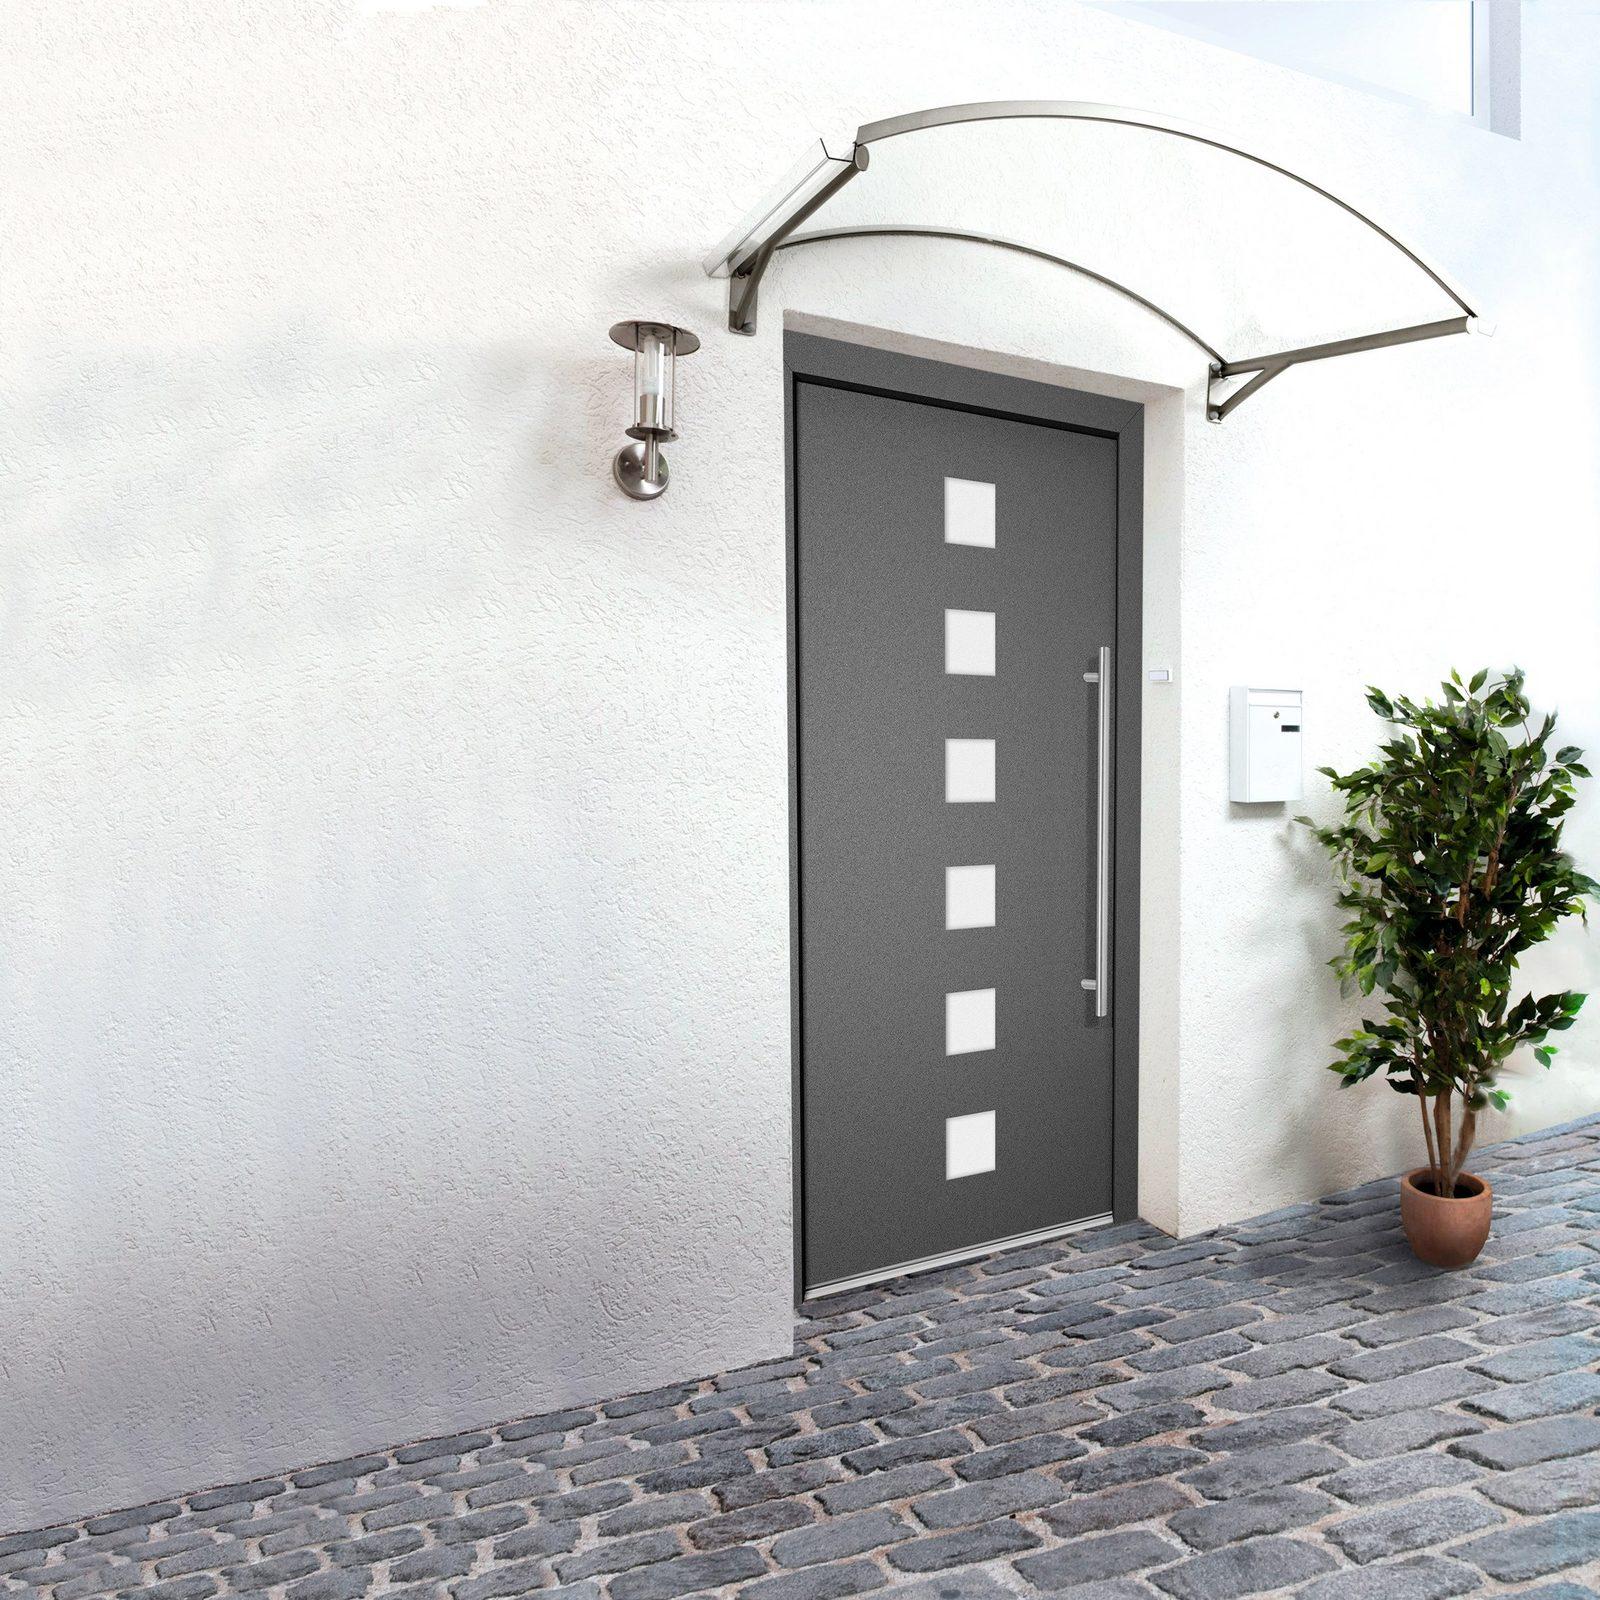 RORO Aluminium-Haustür »Italien«, anthrazit, nach Wunschmaß, Anschlag rechts oder links